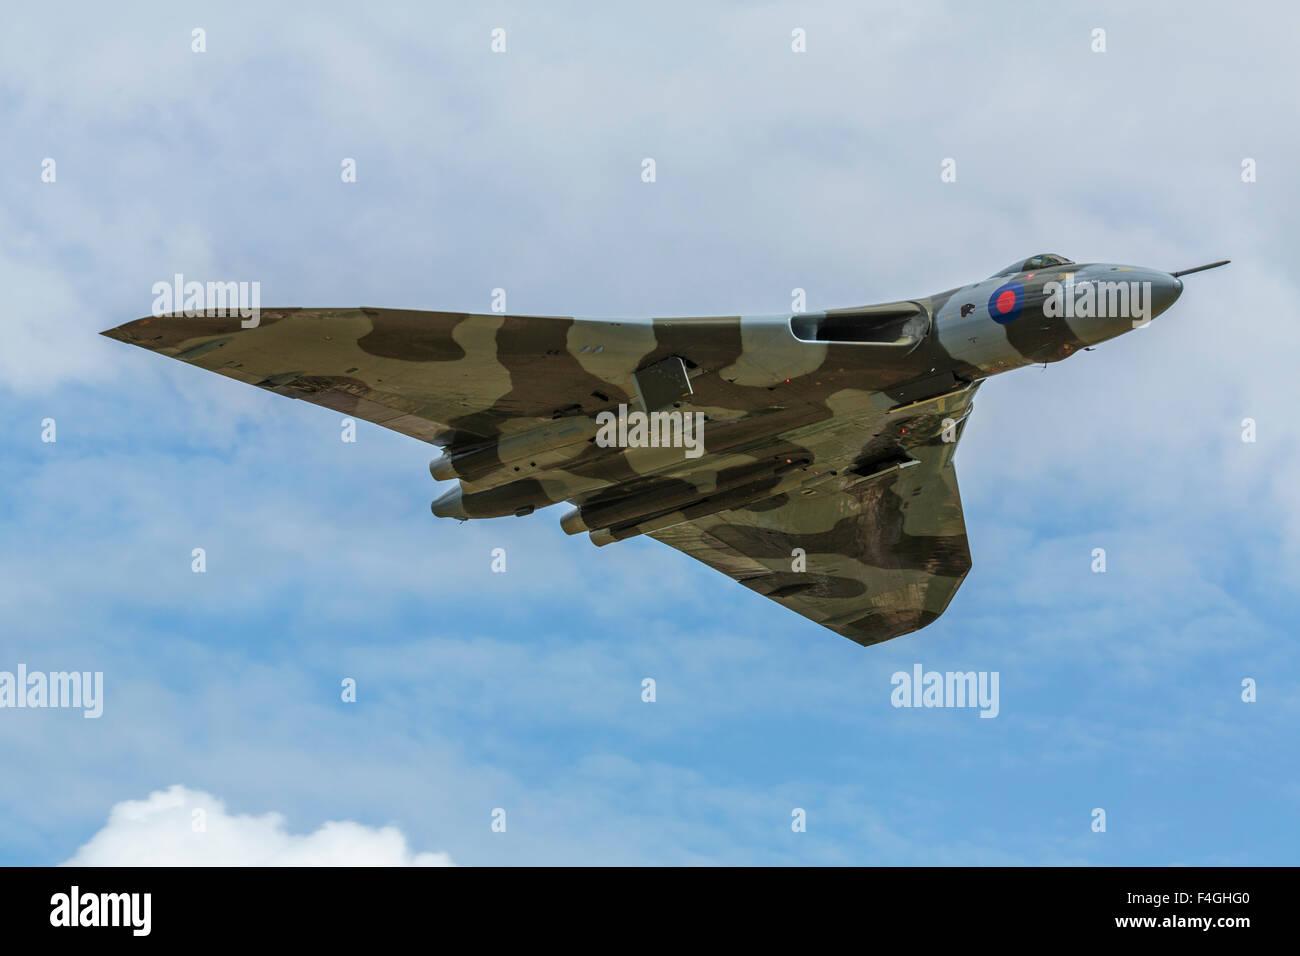 Avro Vulcan XH558 in flight - Stock Image